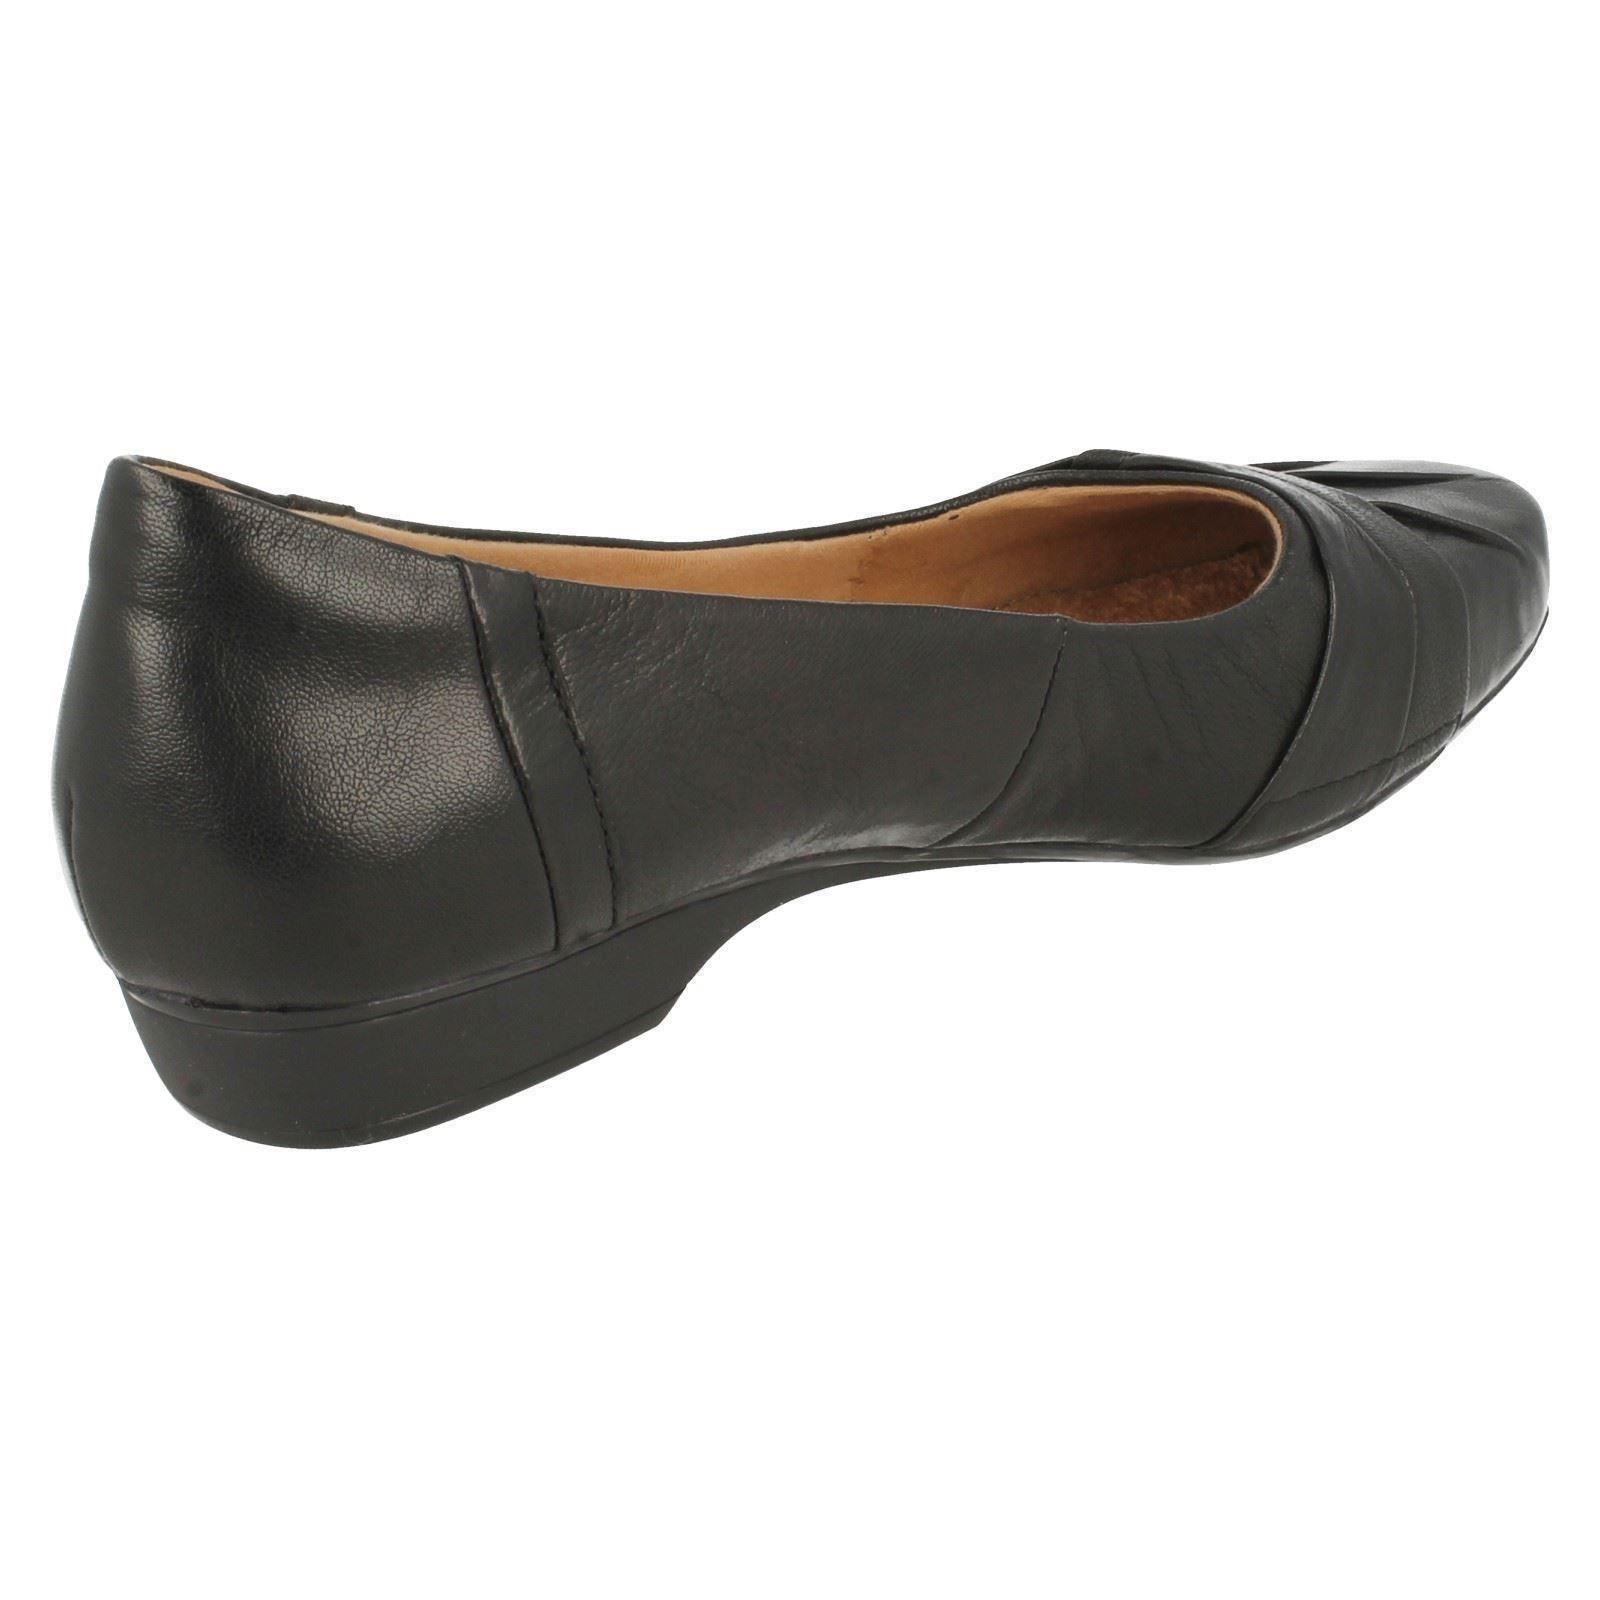 clarks slip on shoes blanche fria ebay